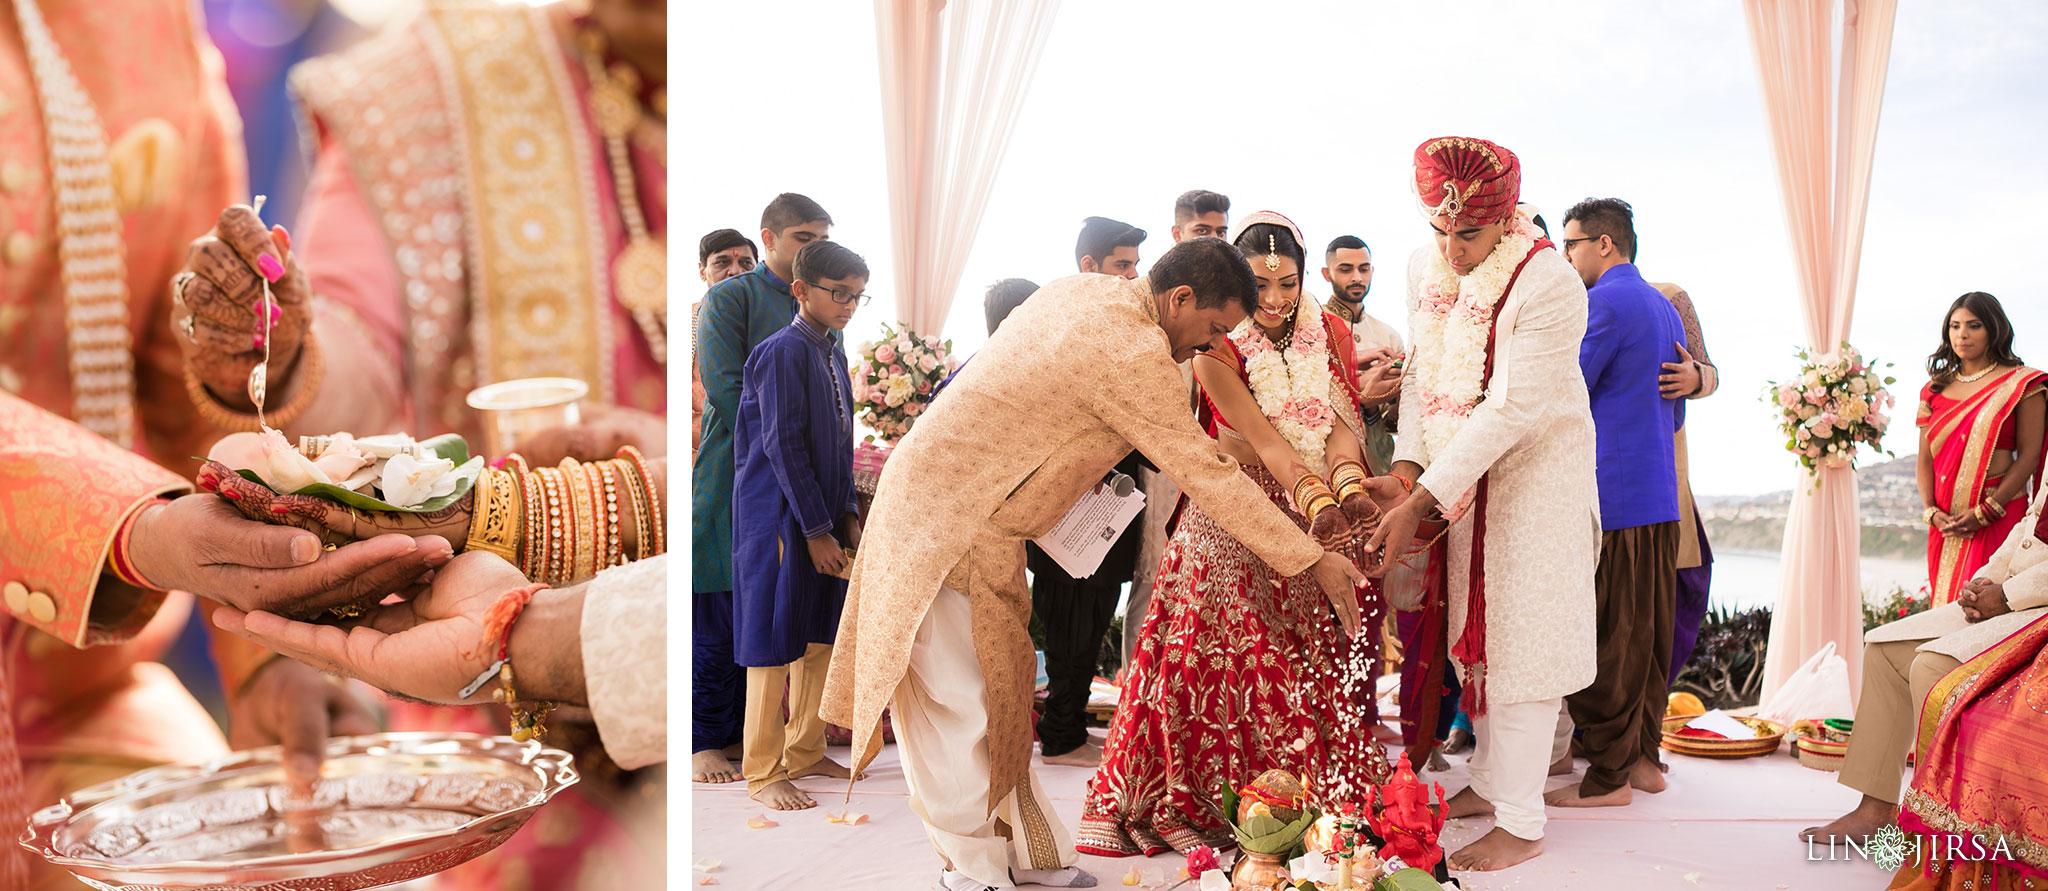 26 ritz carlton laguna niguel indian wedding ceremony photography